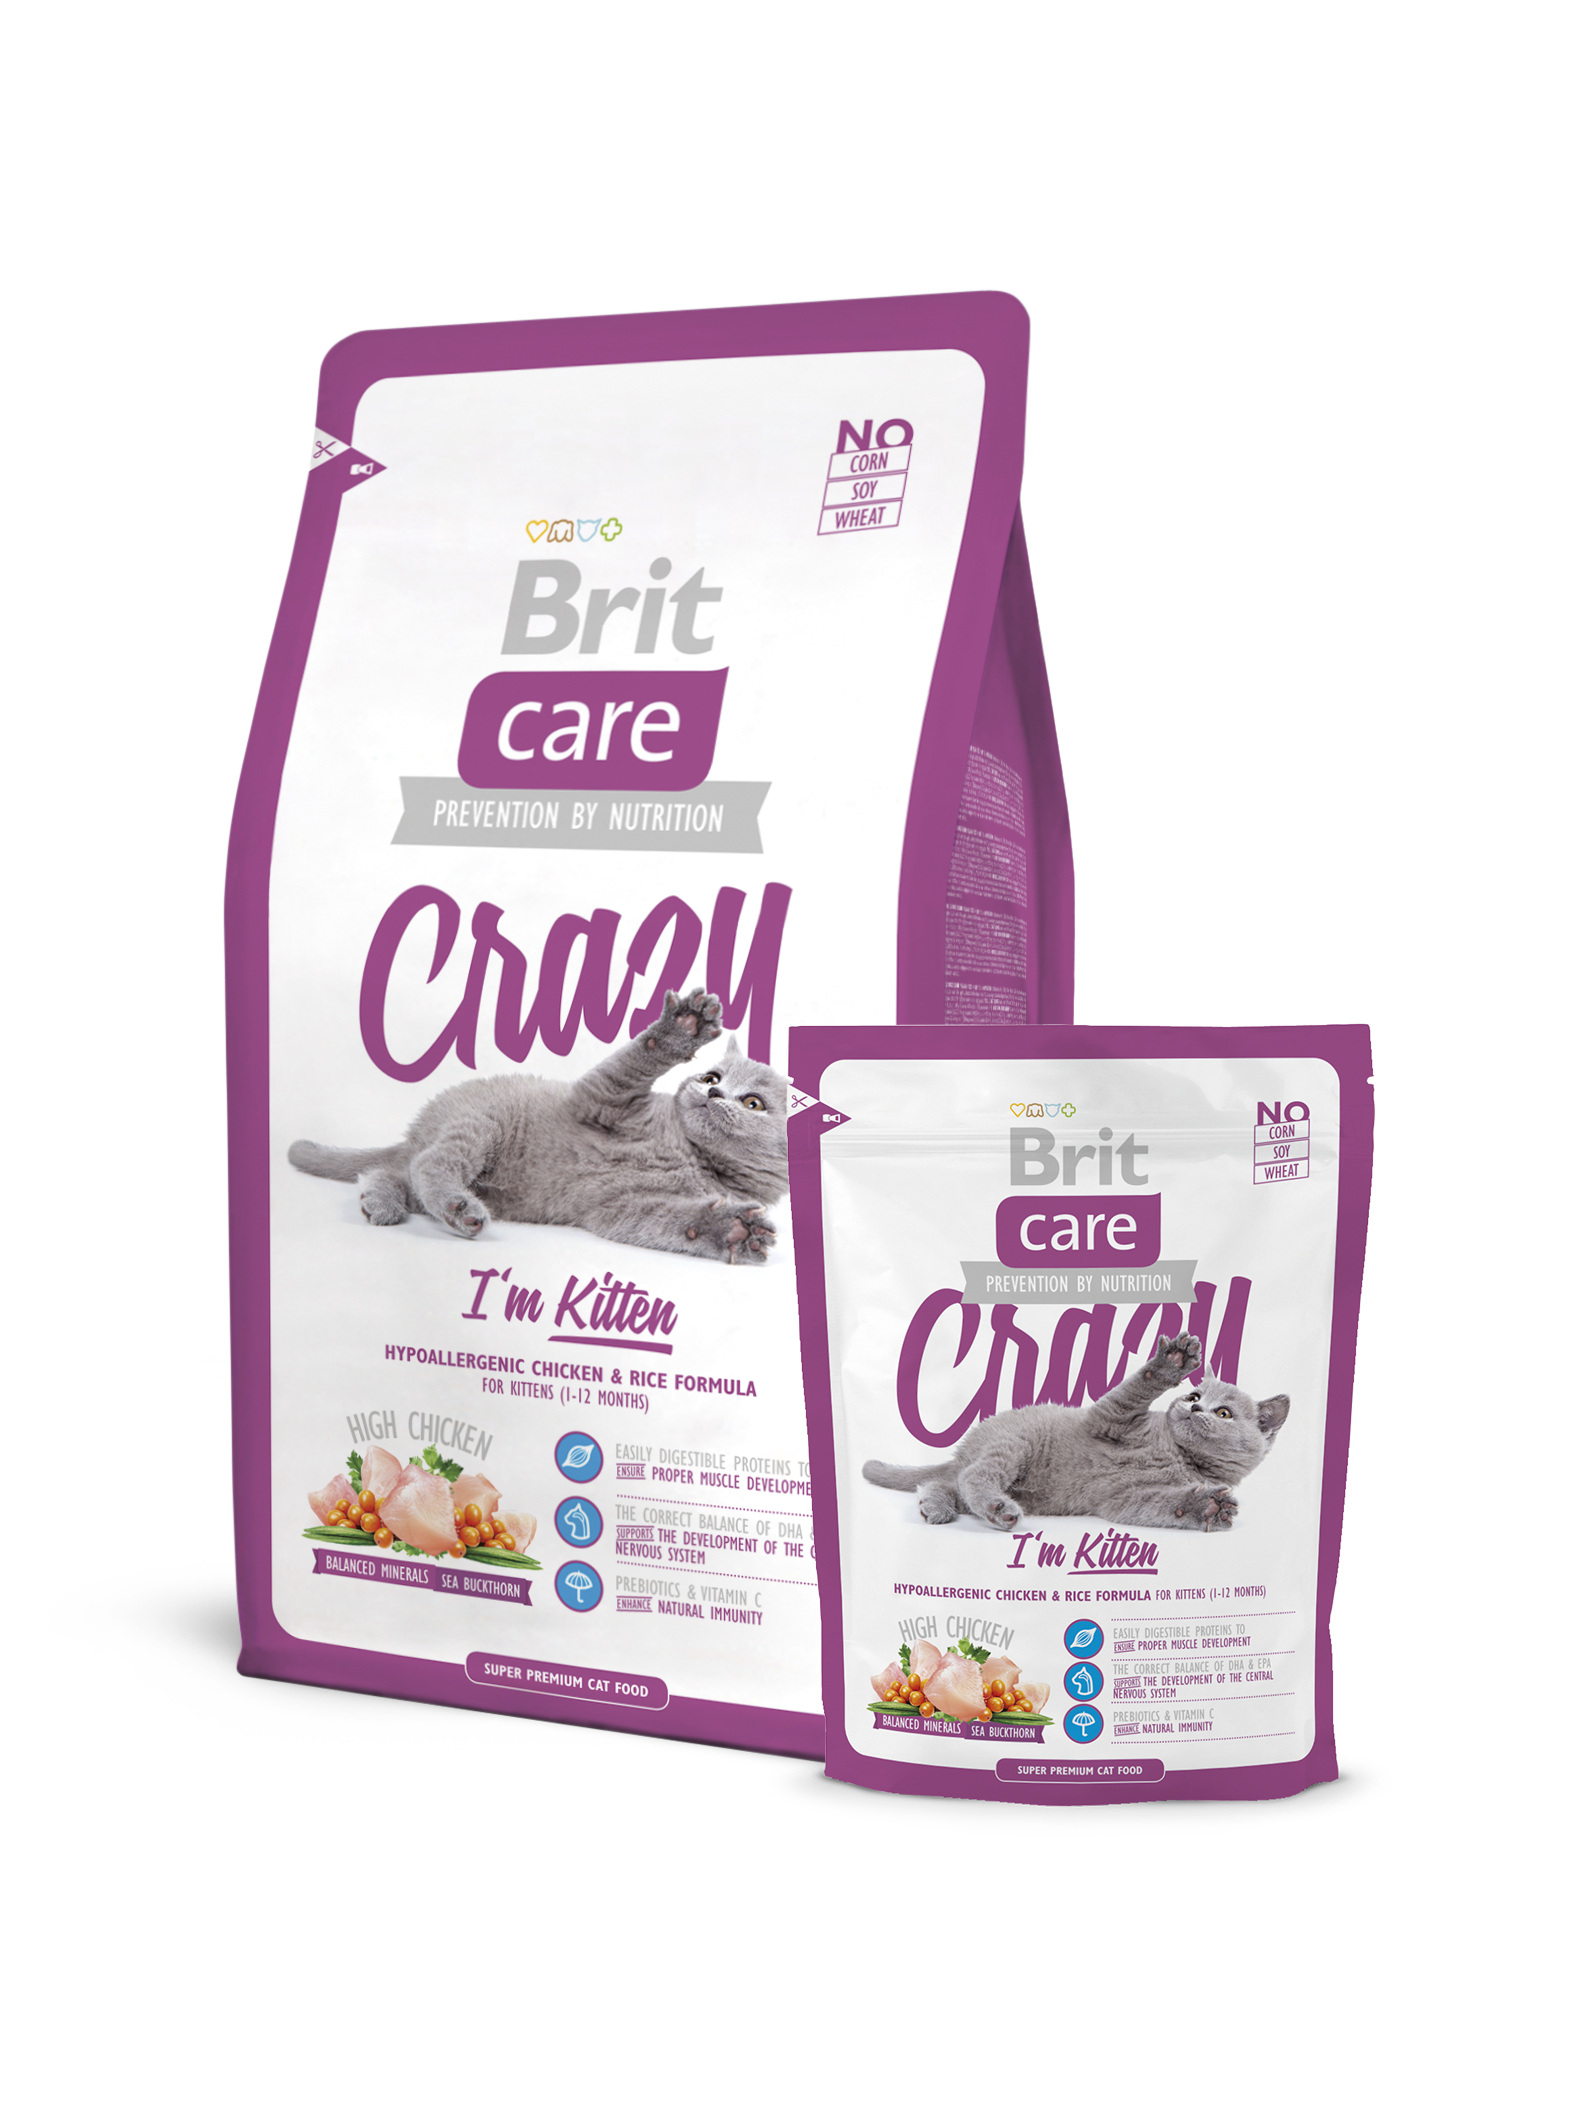 Brit Care Cat Food Crazy I'm Kitten 2kg - Pet Food - Pet Store - Pet supplies